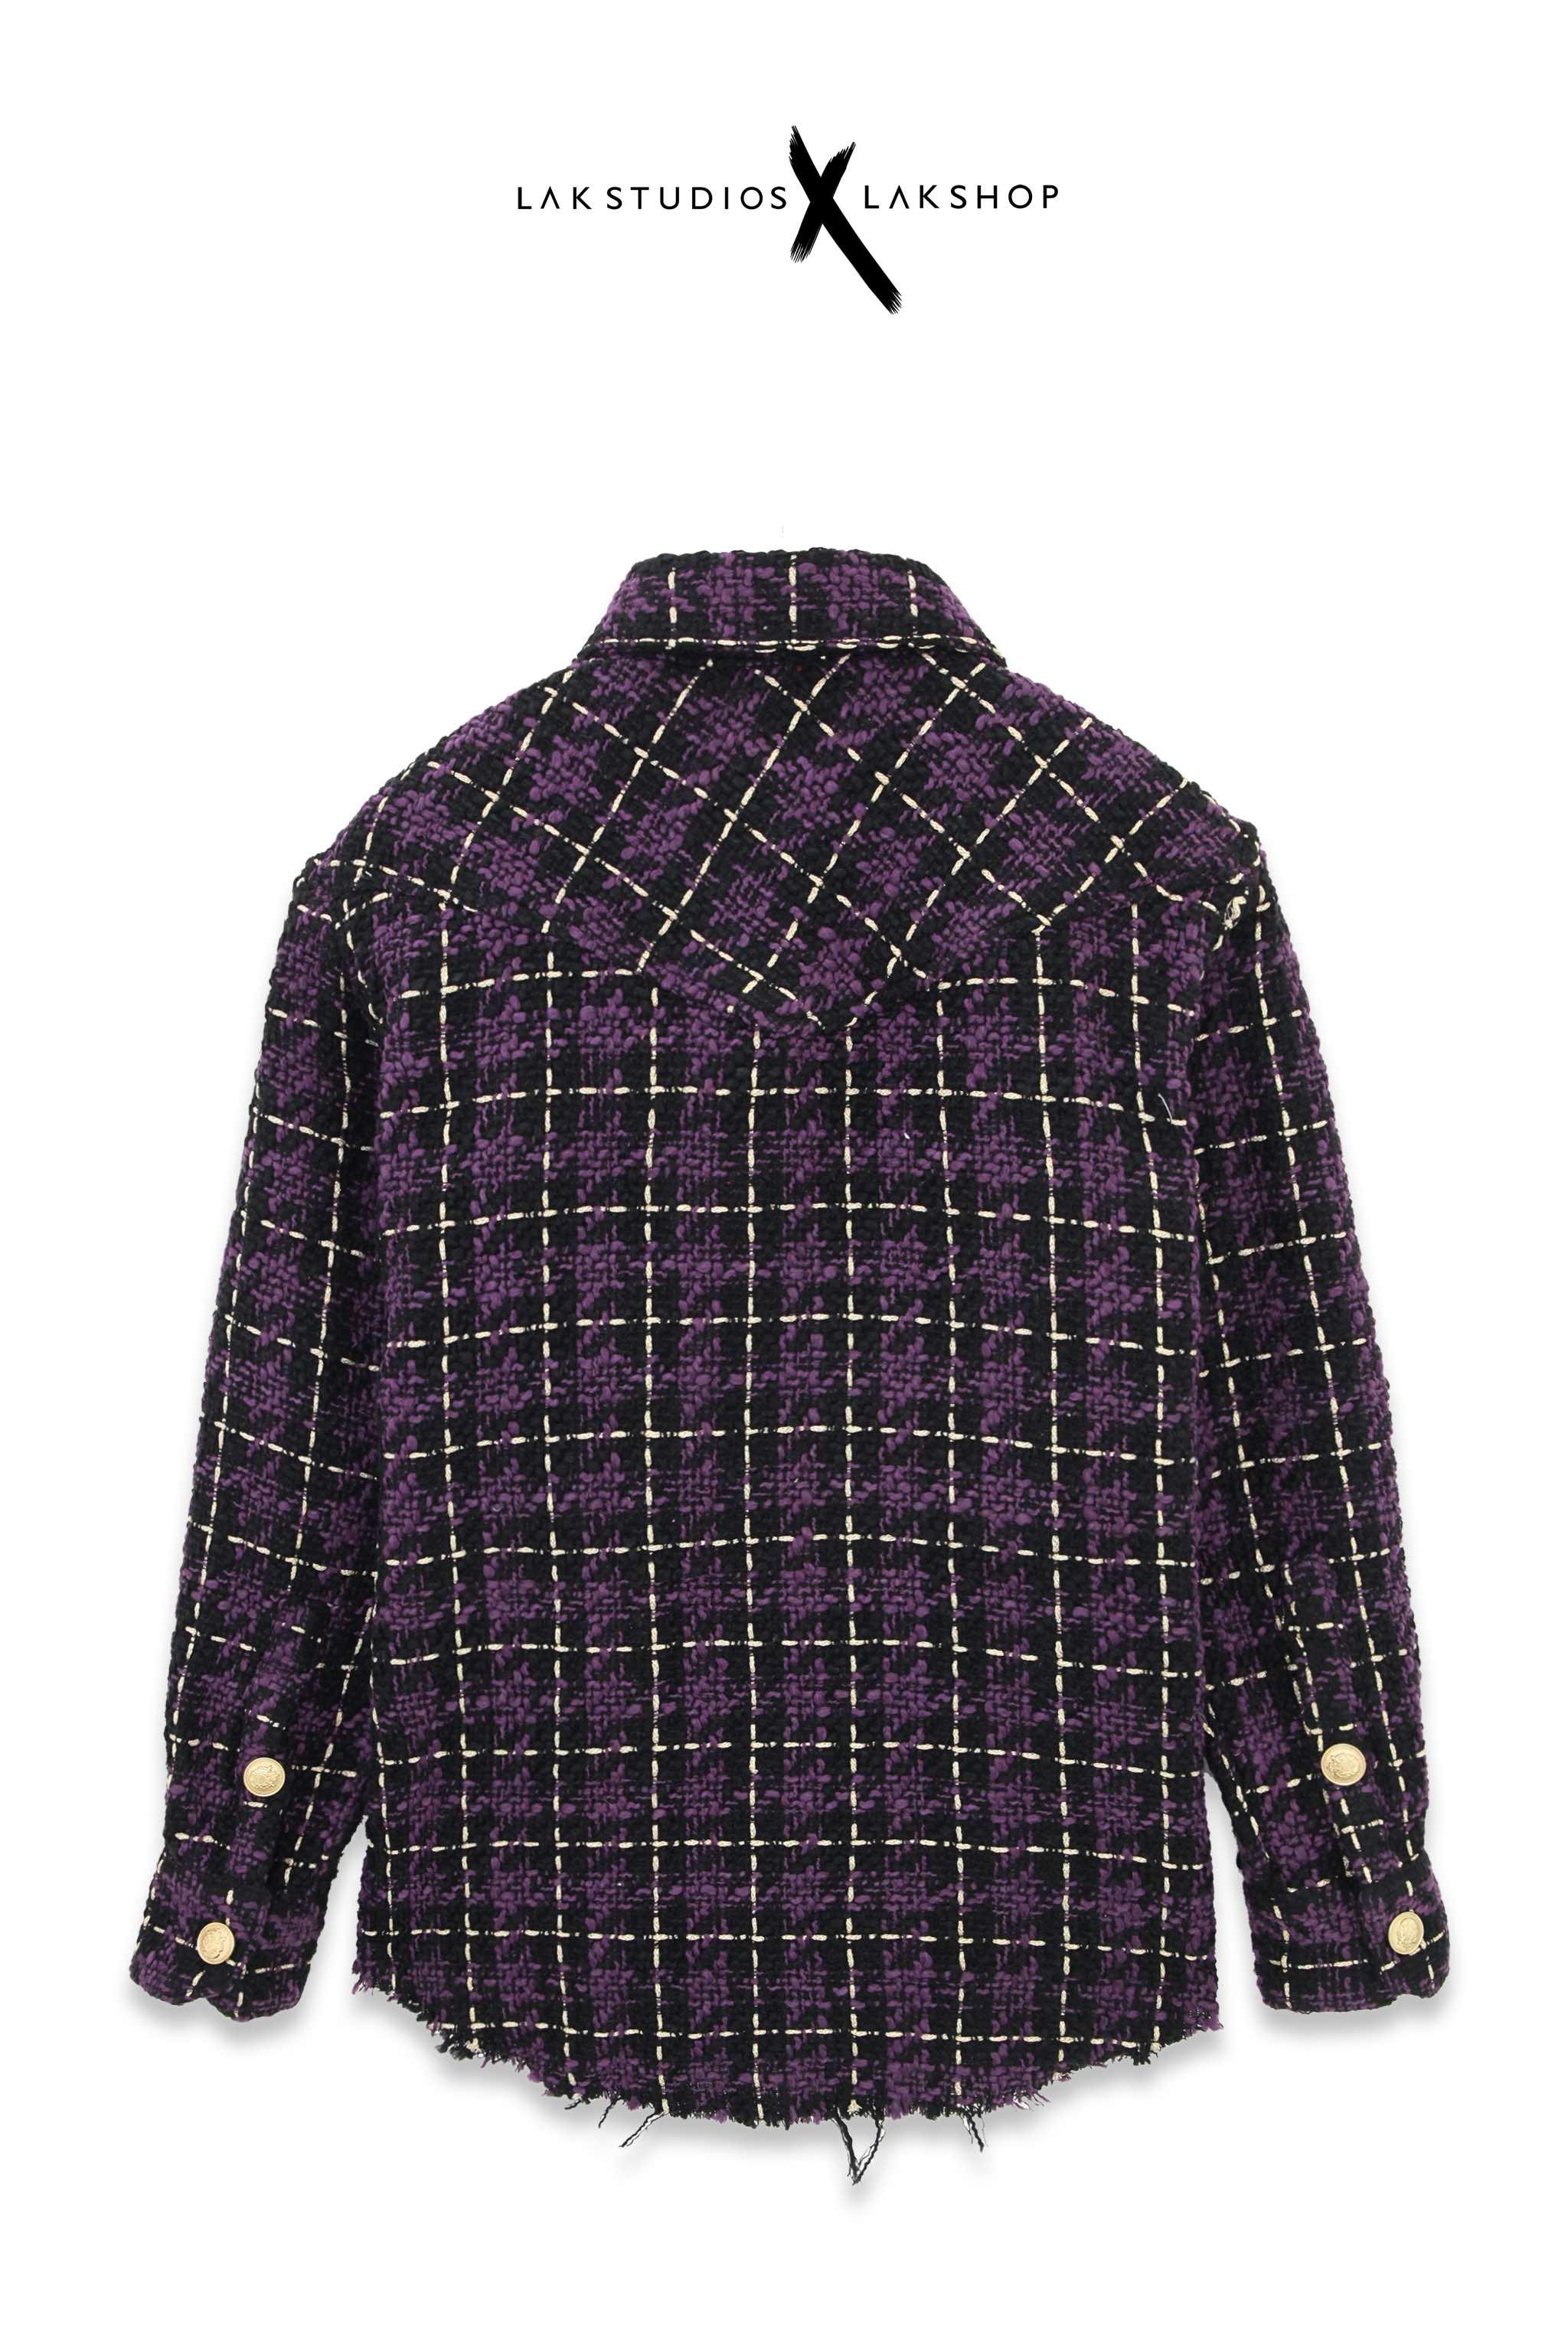 Vòng Tay Louis Vuitton LV Monogram Chain Bracele Fullbox